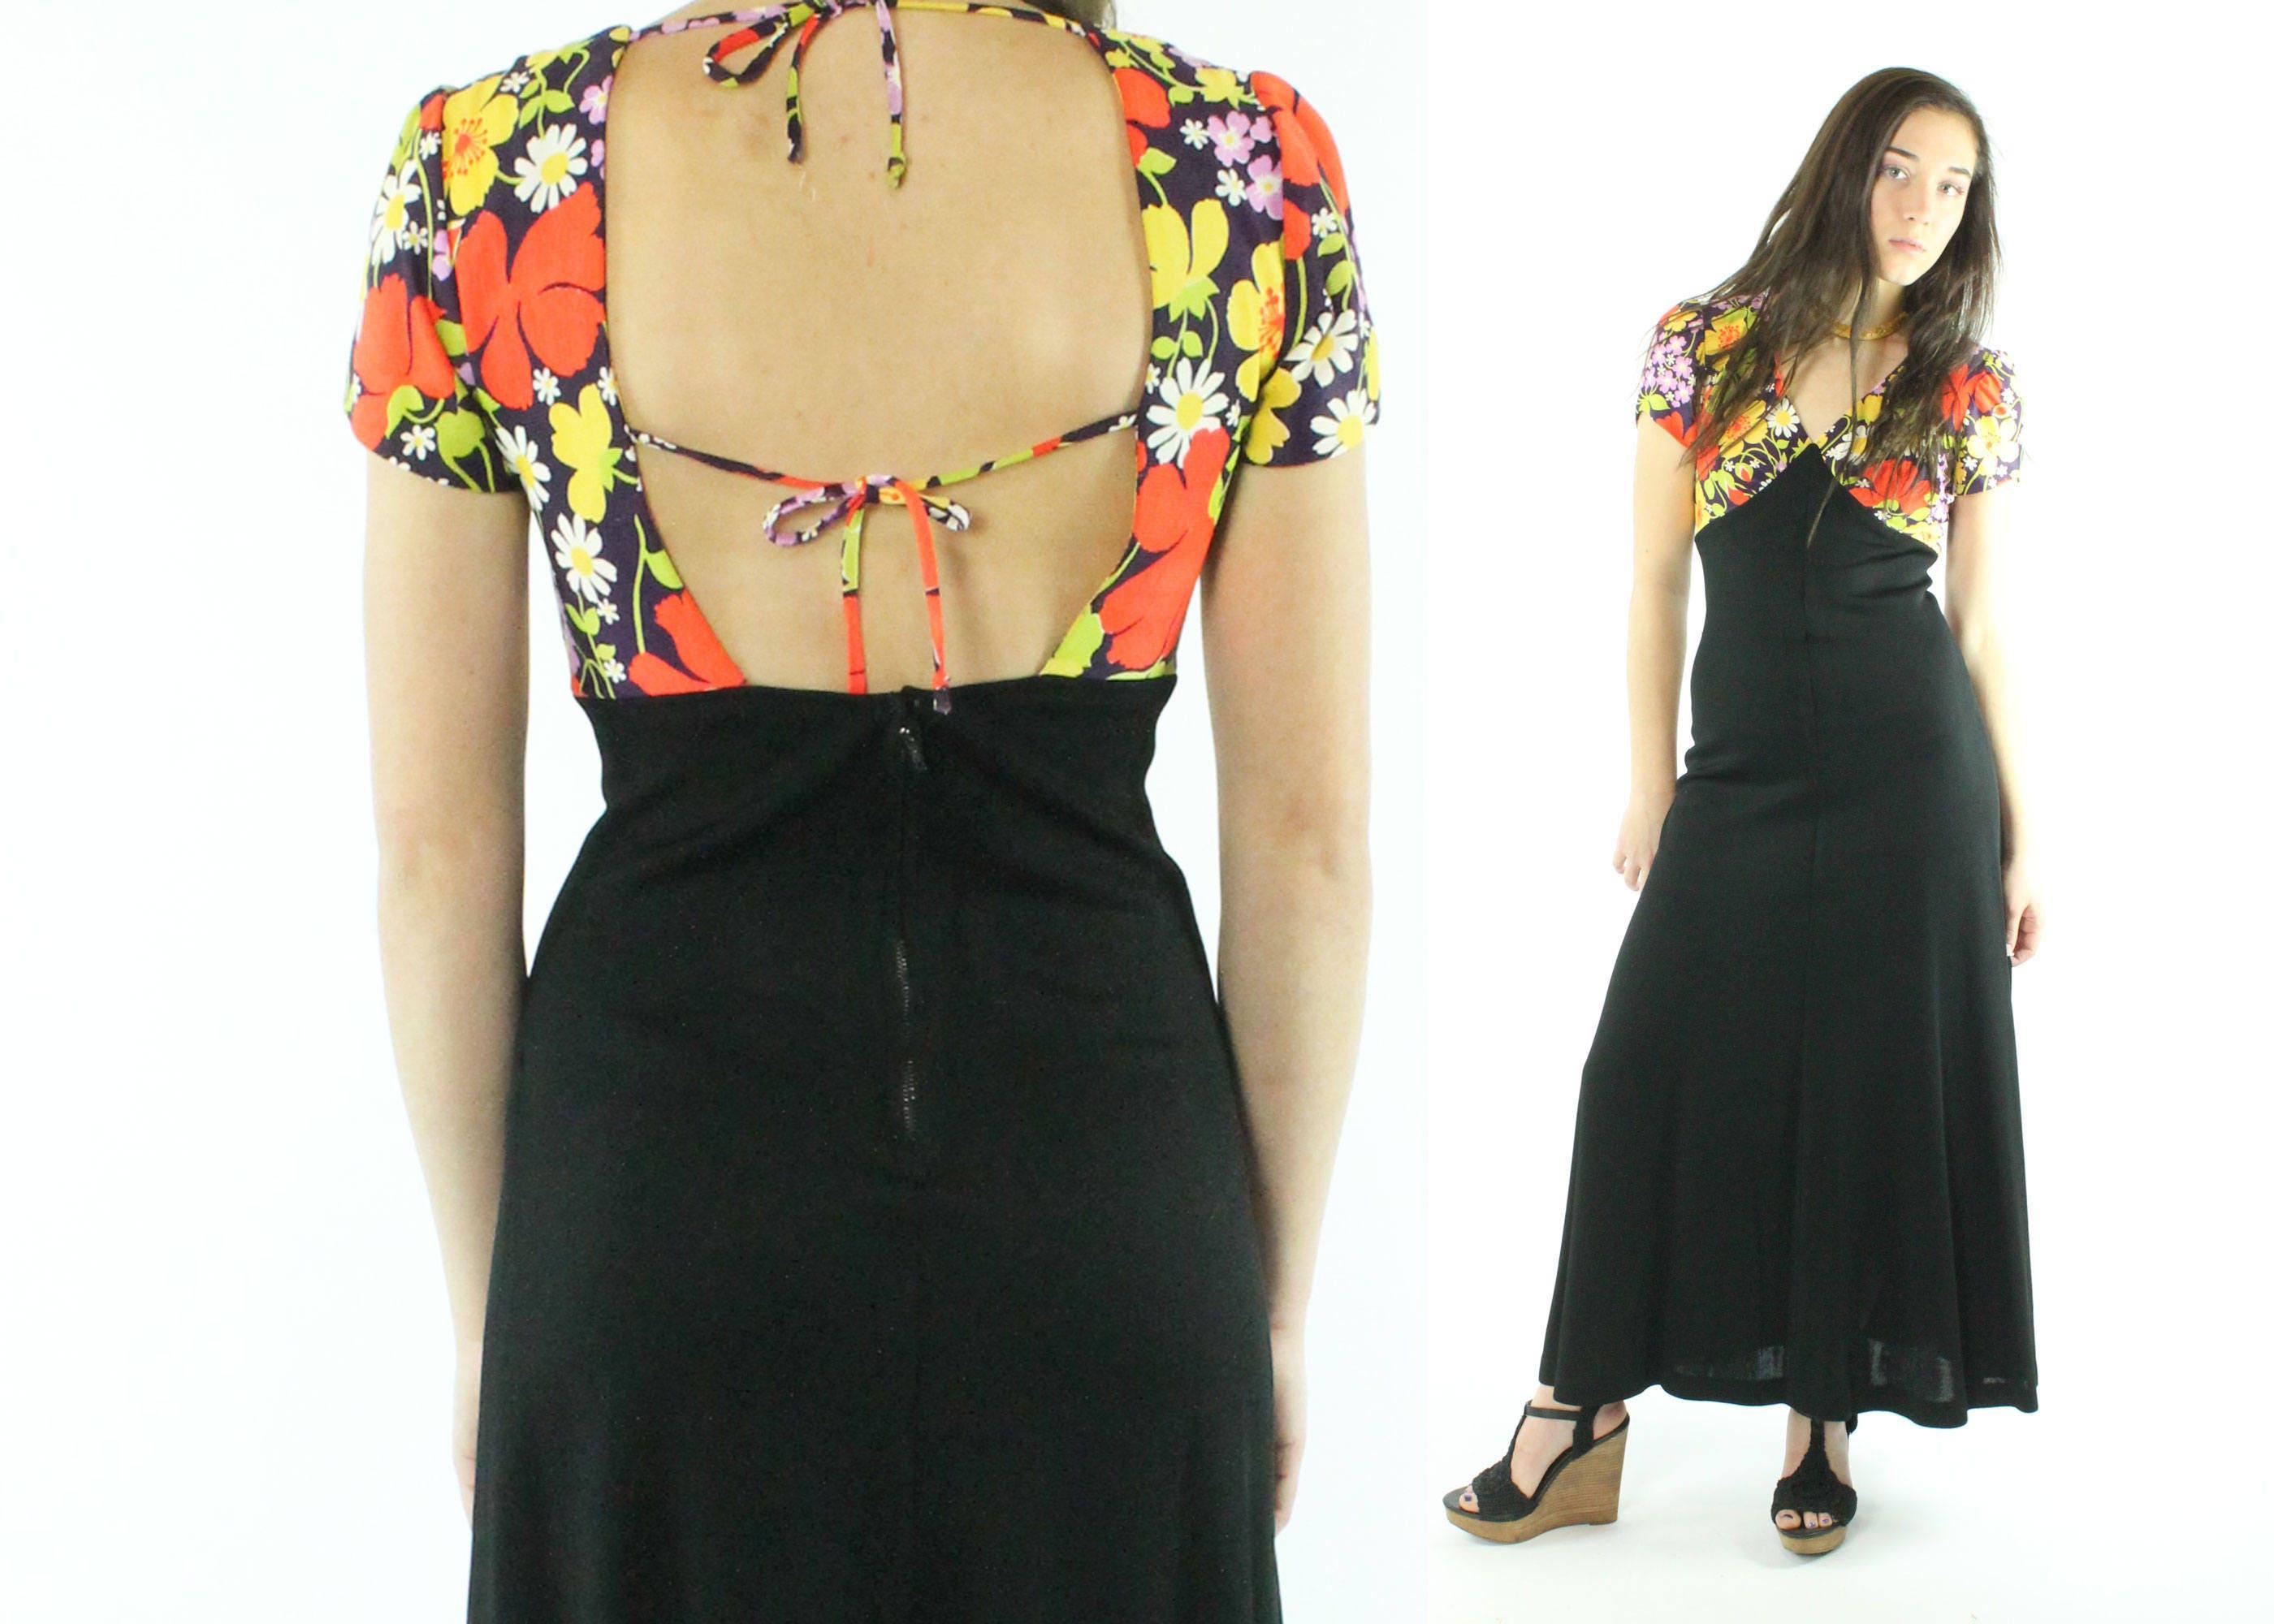 d2c57cc2 70s Maxi Dress Floral Sundress Deep V Open Back Short Sleeves | Etsy